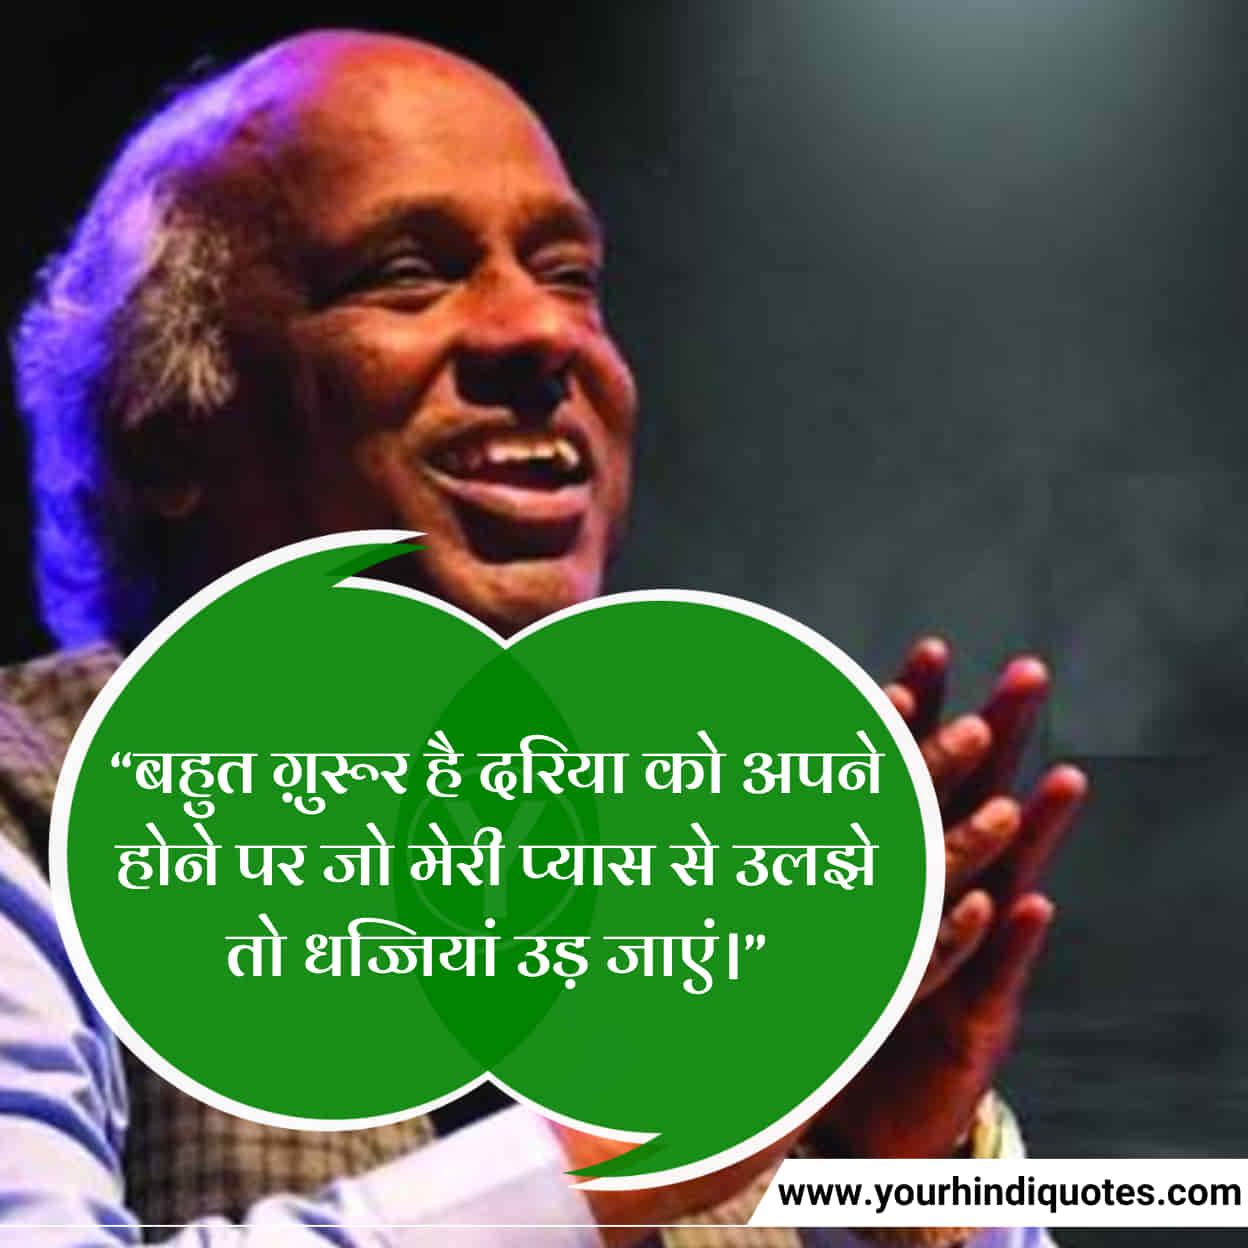 Latest Rahat Indori Shayari on Life